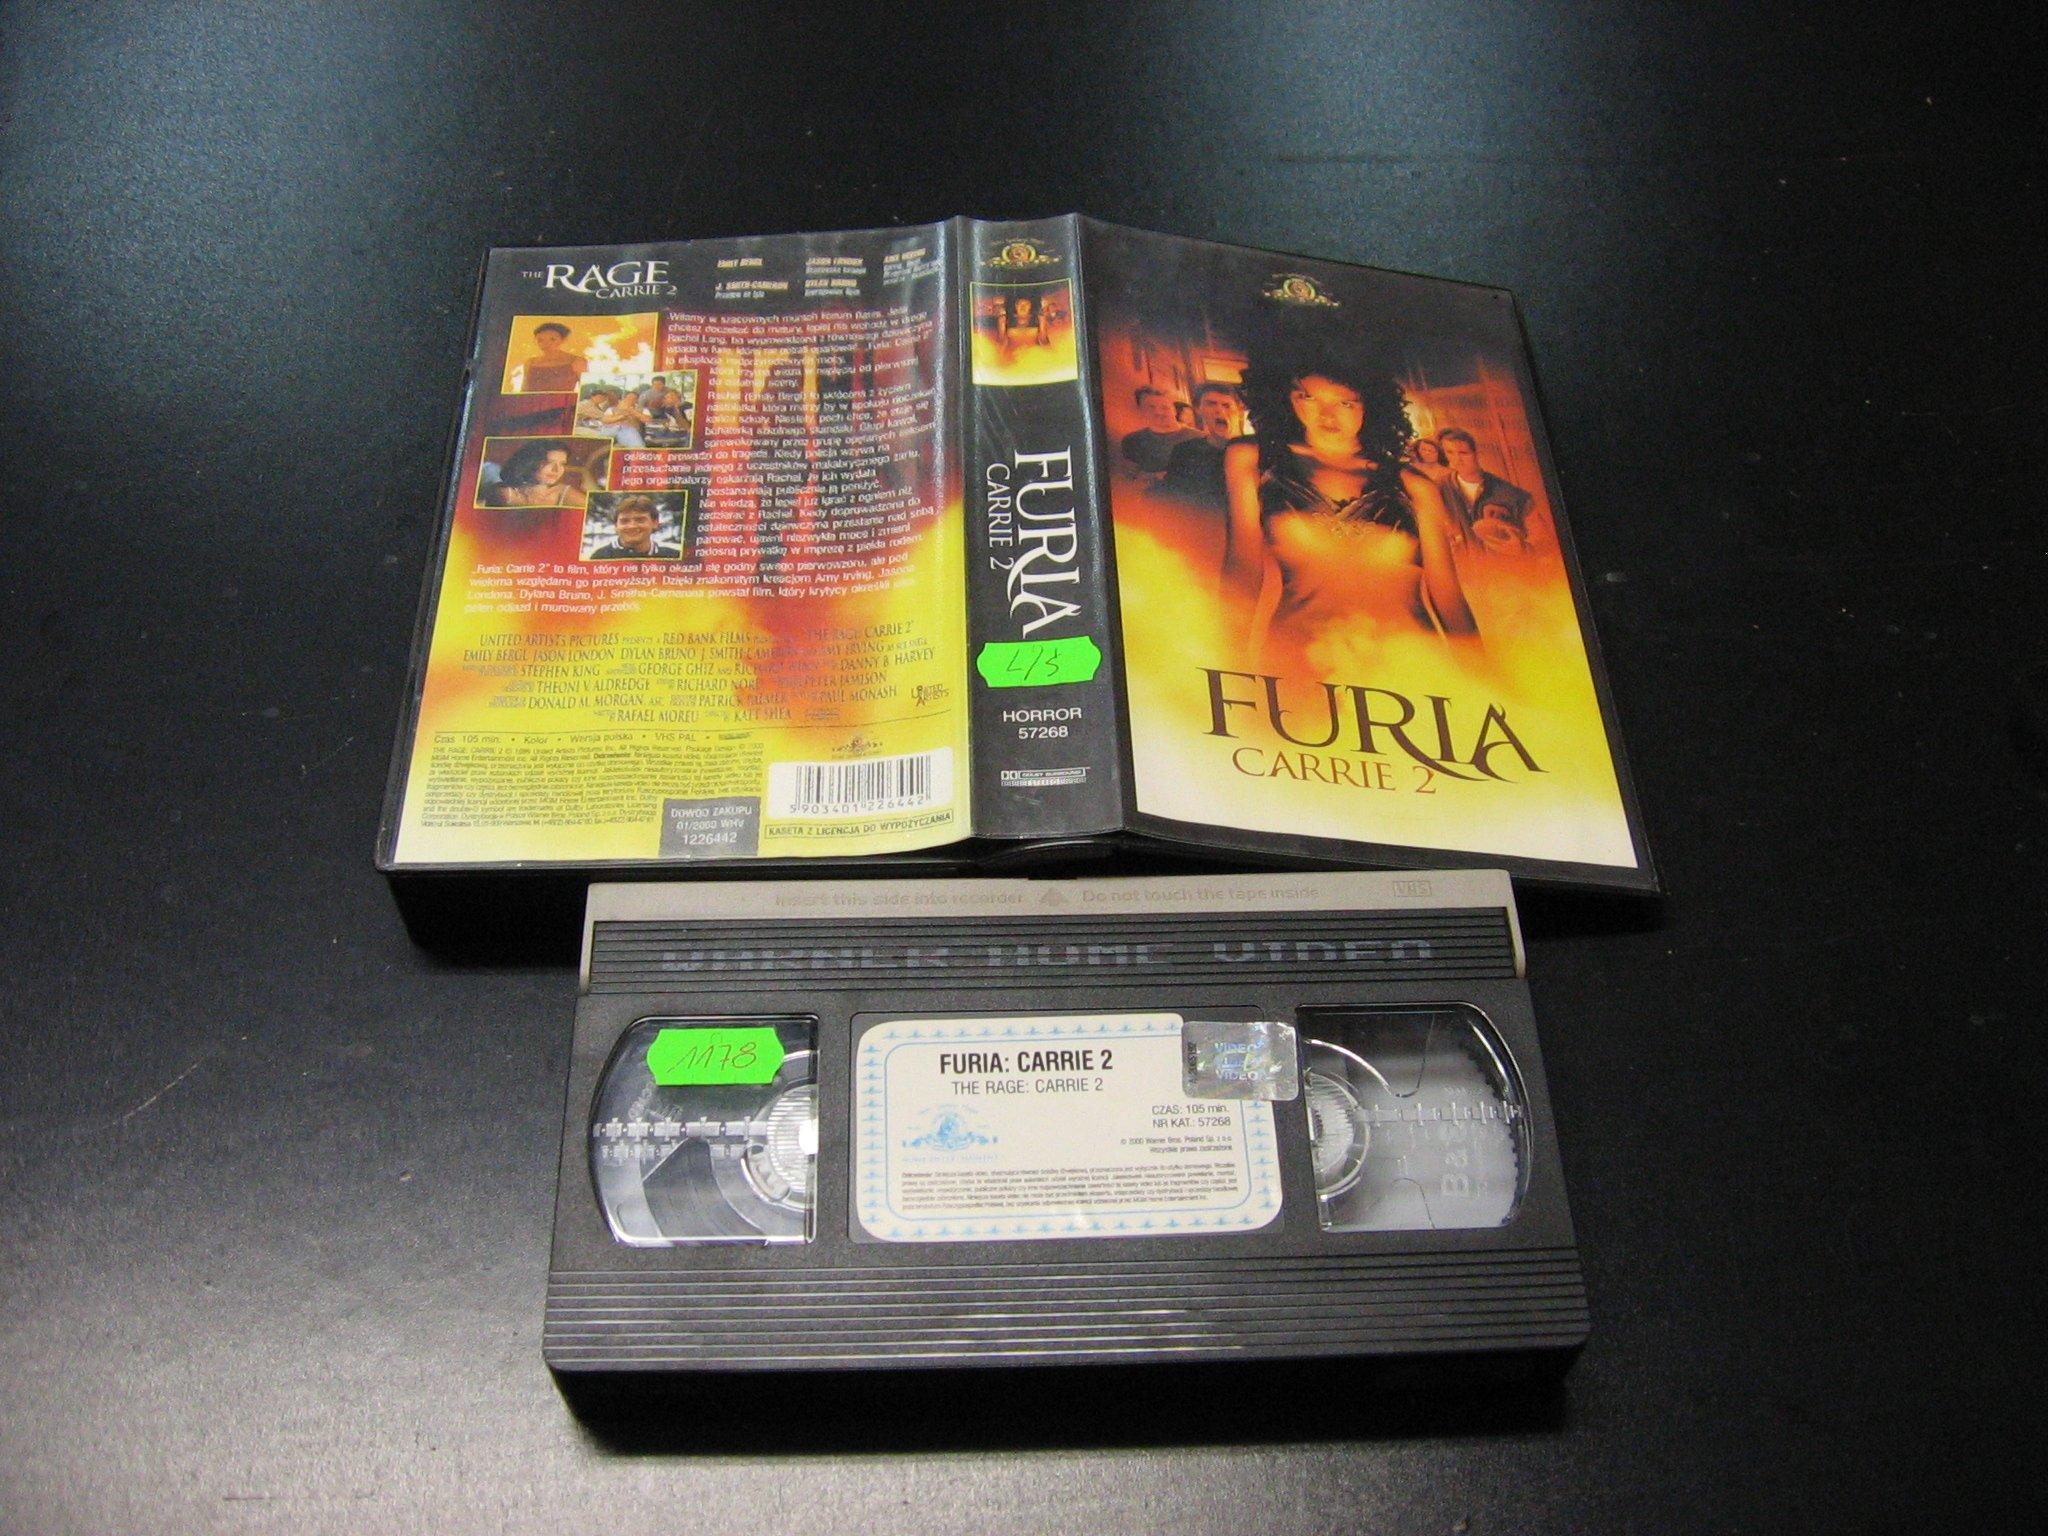 FURIA CARRIE 2 -  kaseta VHS - 1017 Opole - AlleOpole.pl